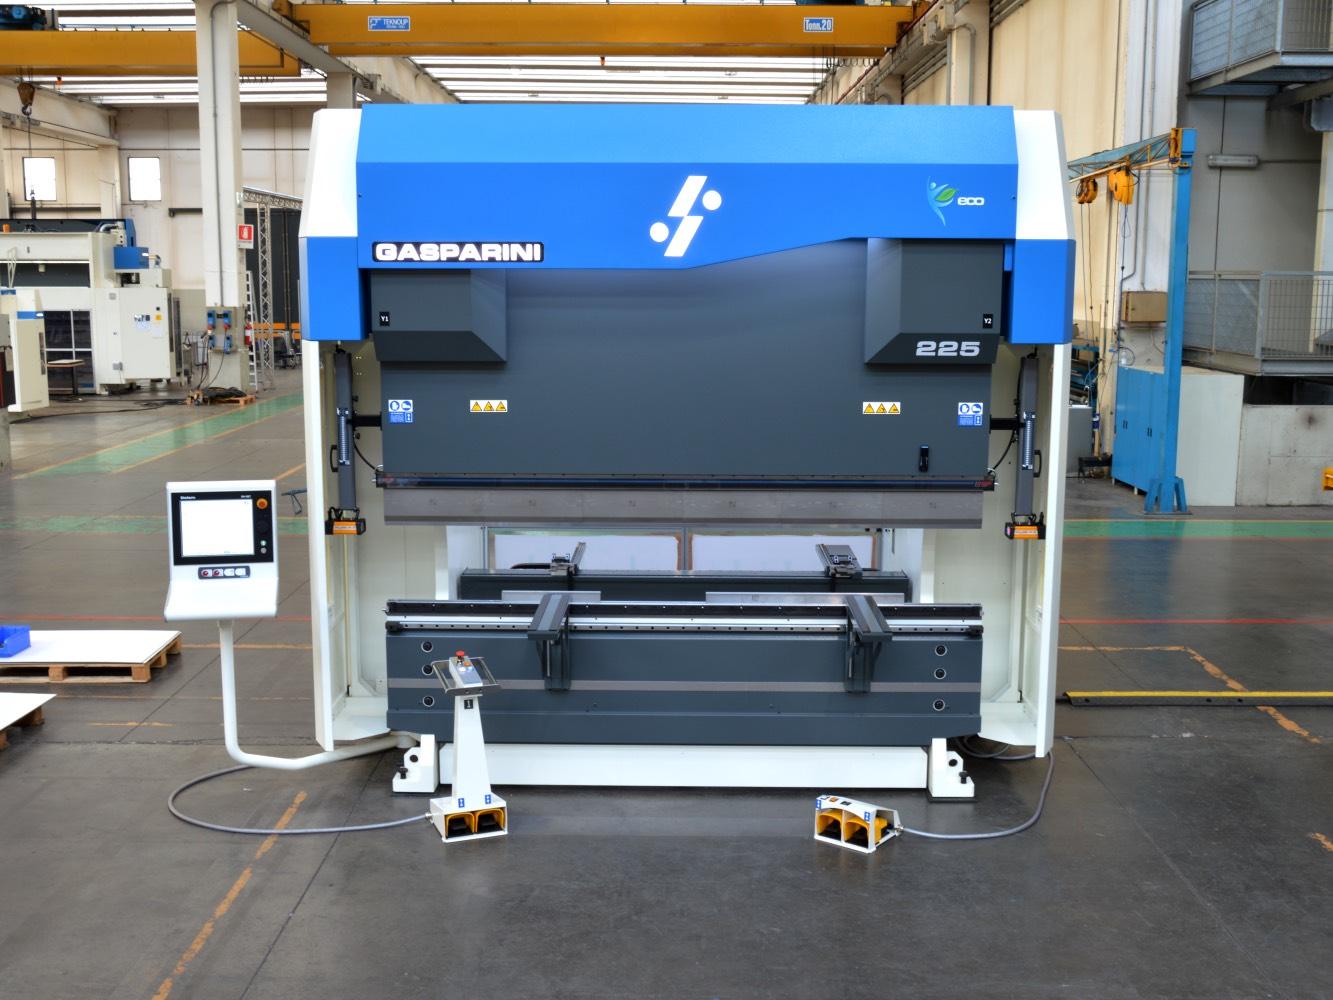 prensa plegadora 3 metros transformado de chapa metálica